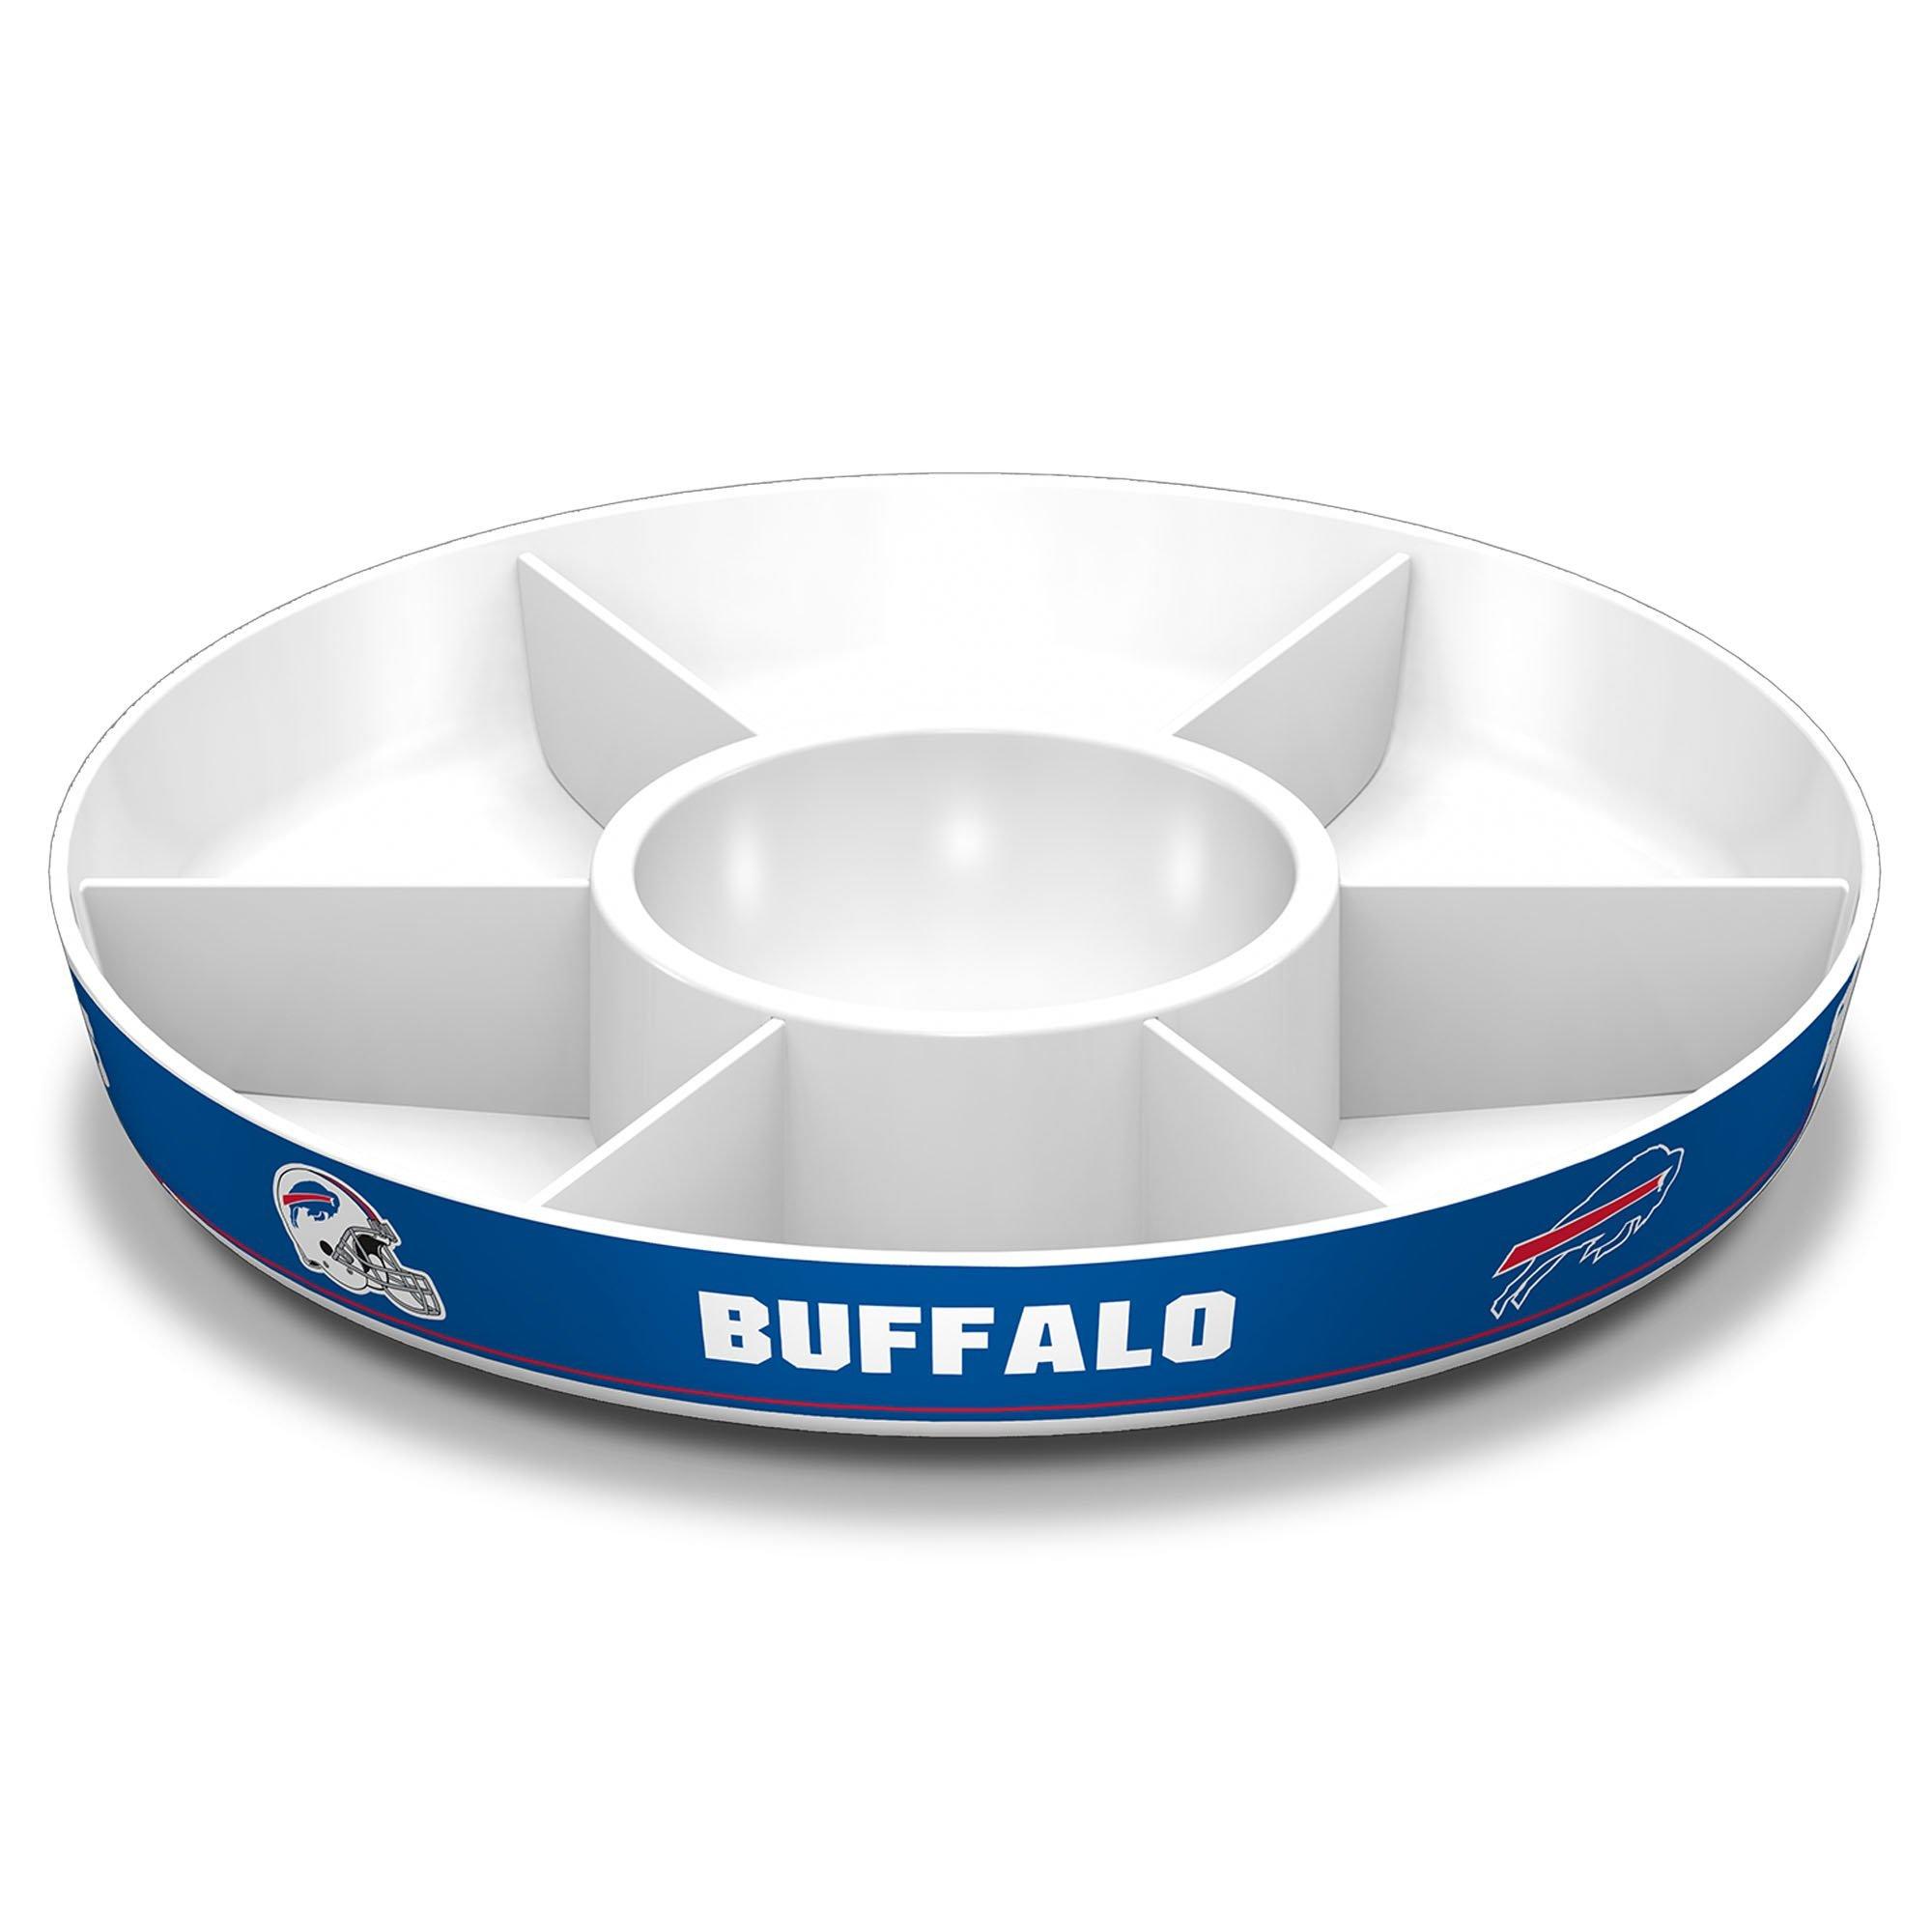 Fremont Die NFL Buffalo Bills Party Platter by Fremont Die